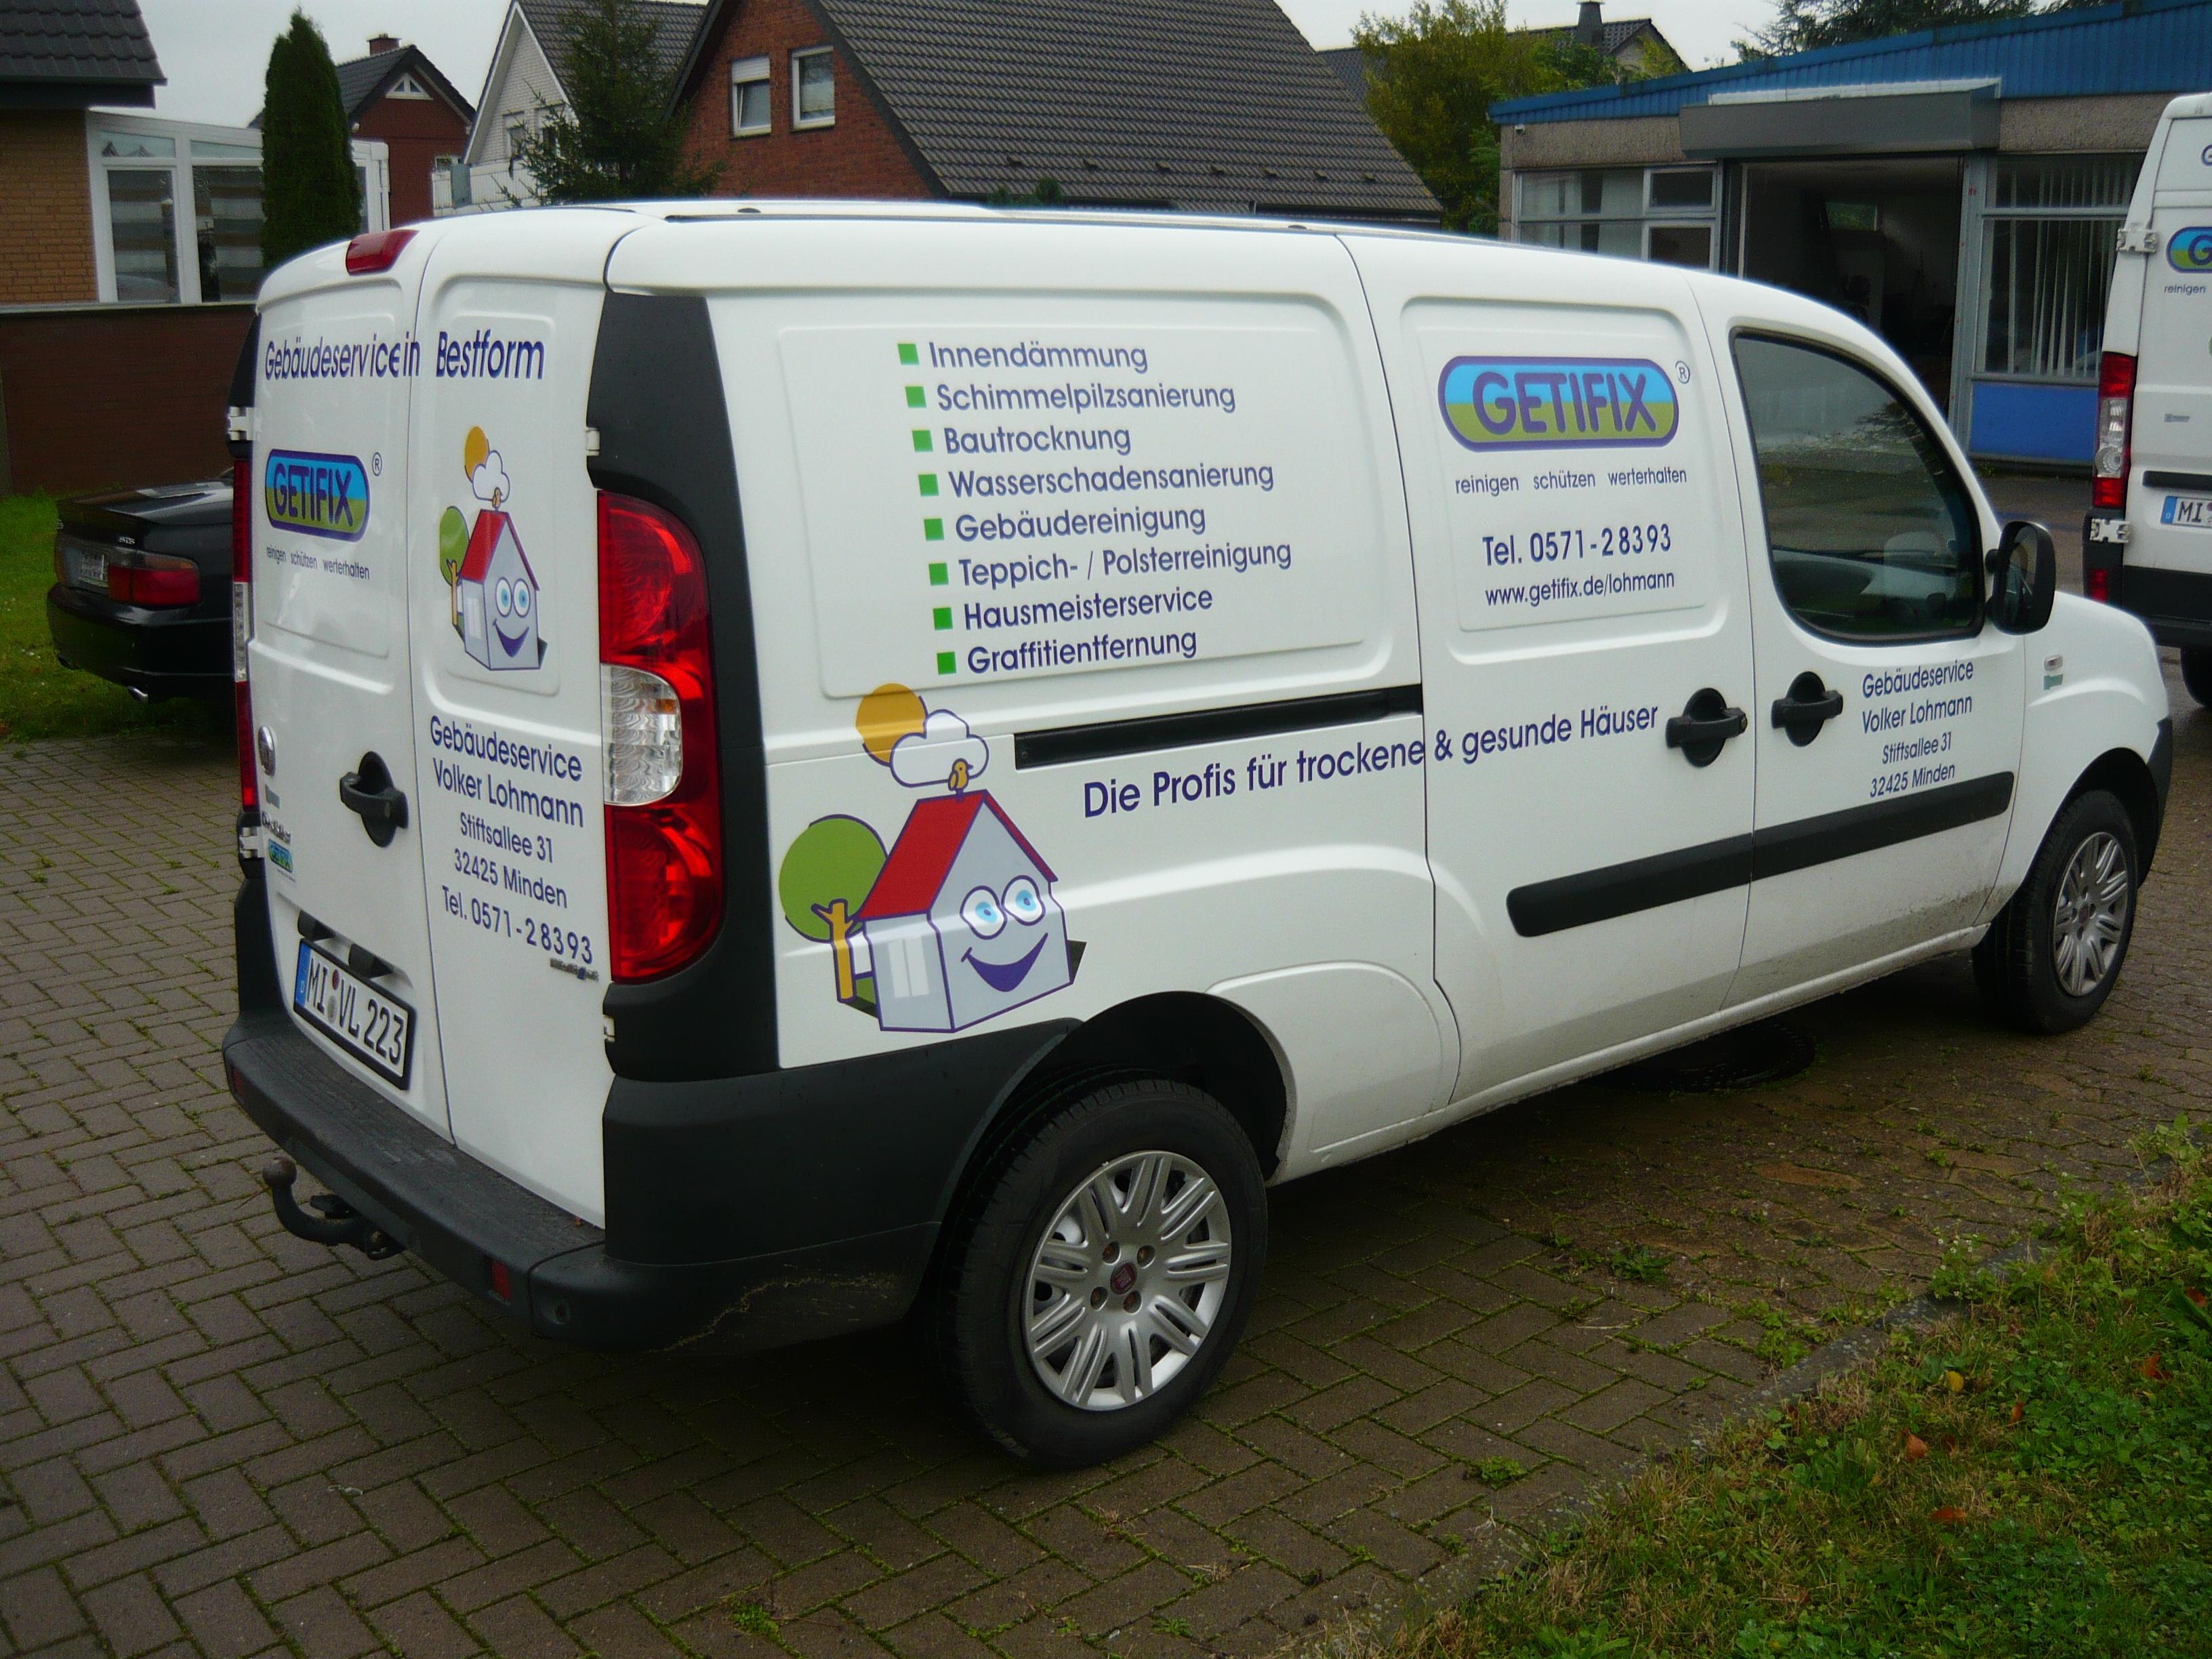 Werbe Discounter Webshop Fahrzeugbeschriftungen Online